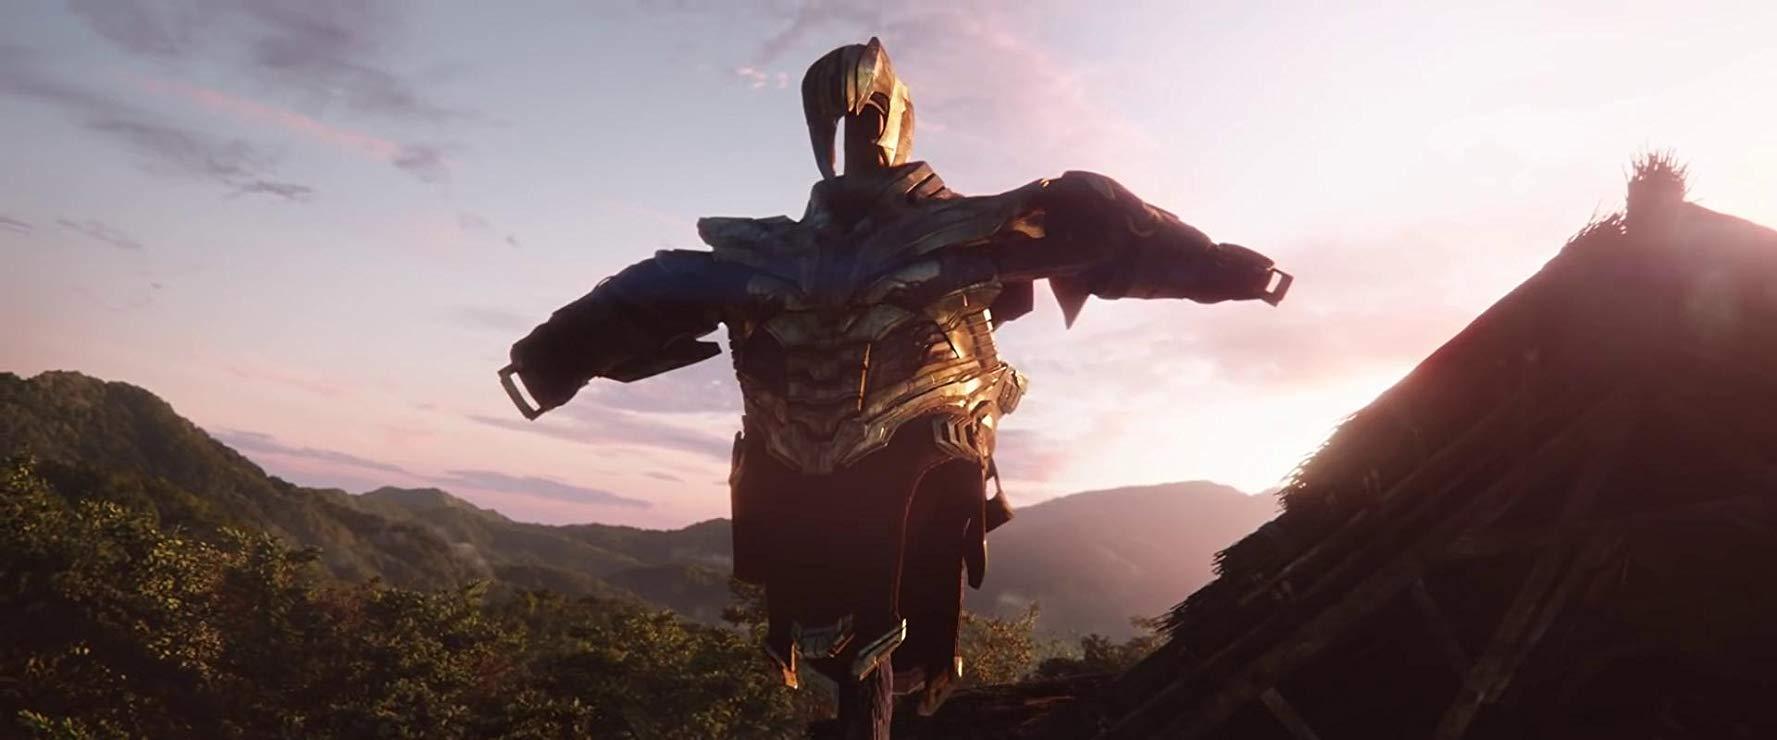 Avengers: Endgame Box Office Prediction Tracking